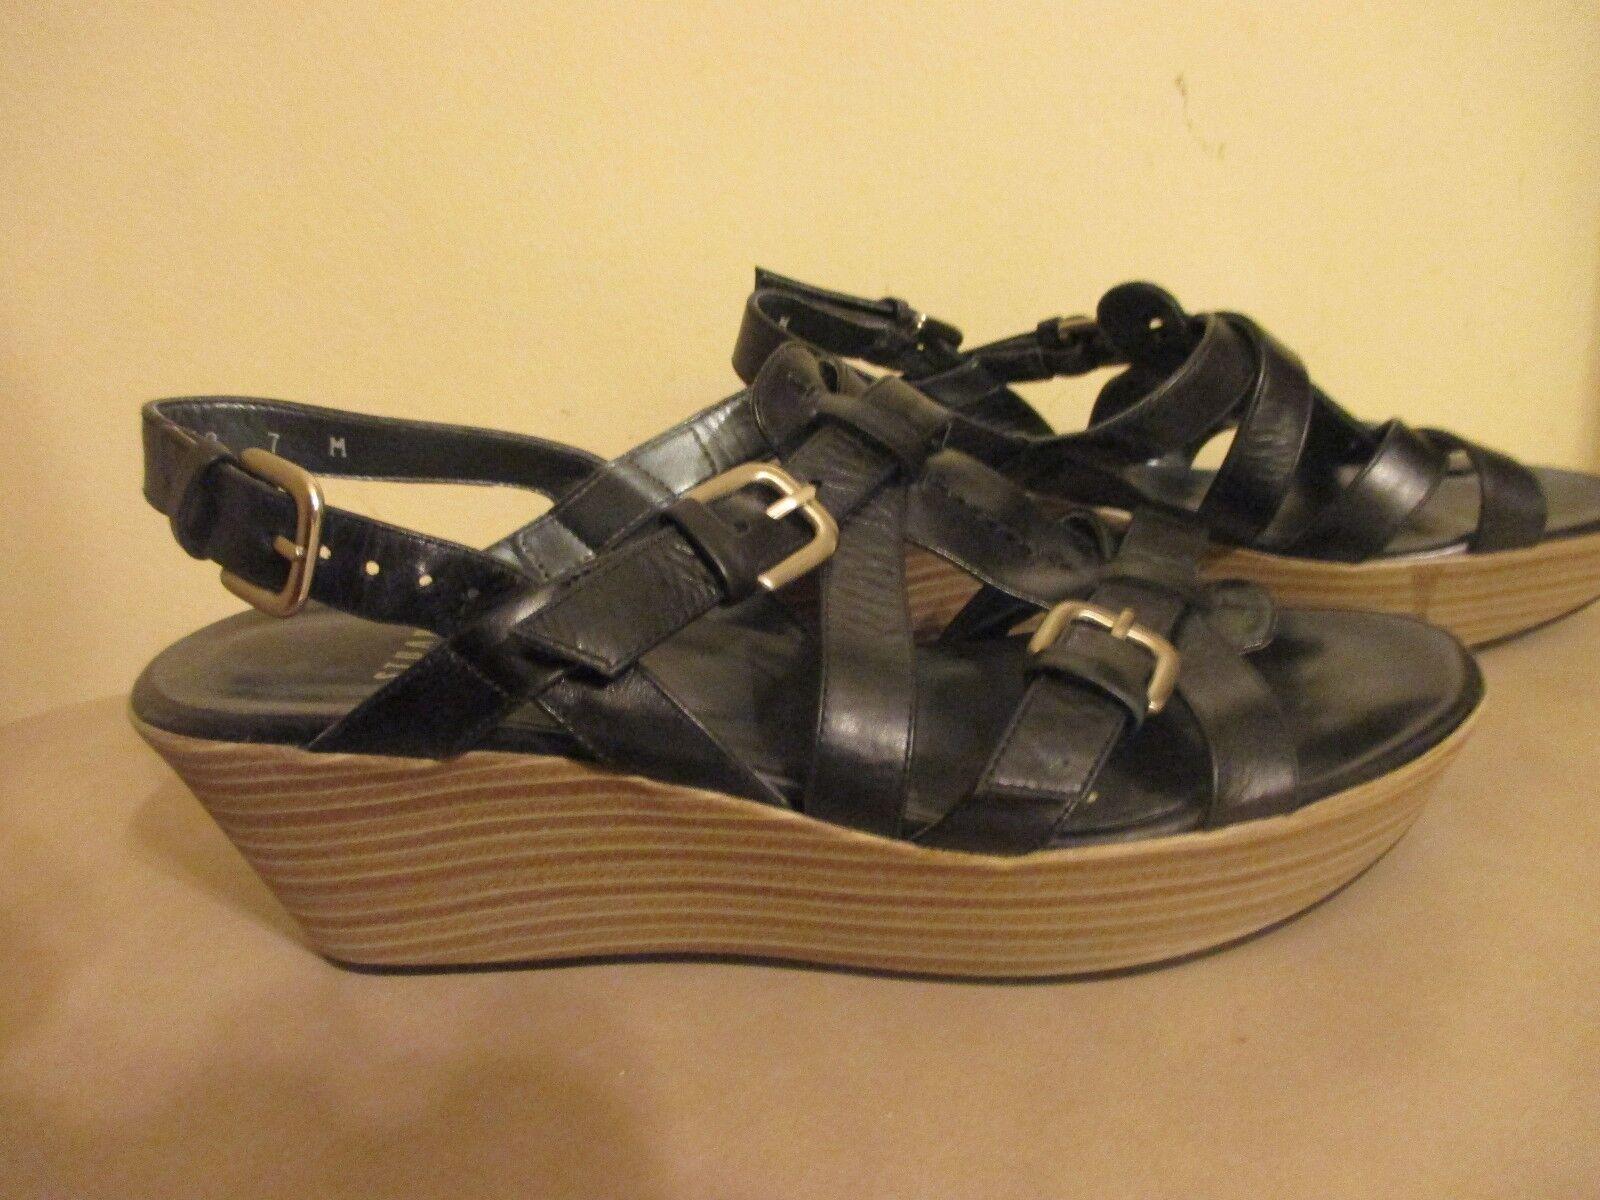 Stuart Weitzman Strappy Wedge Sandale Slingback schwarz Leder Größe 7 M 2